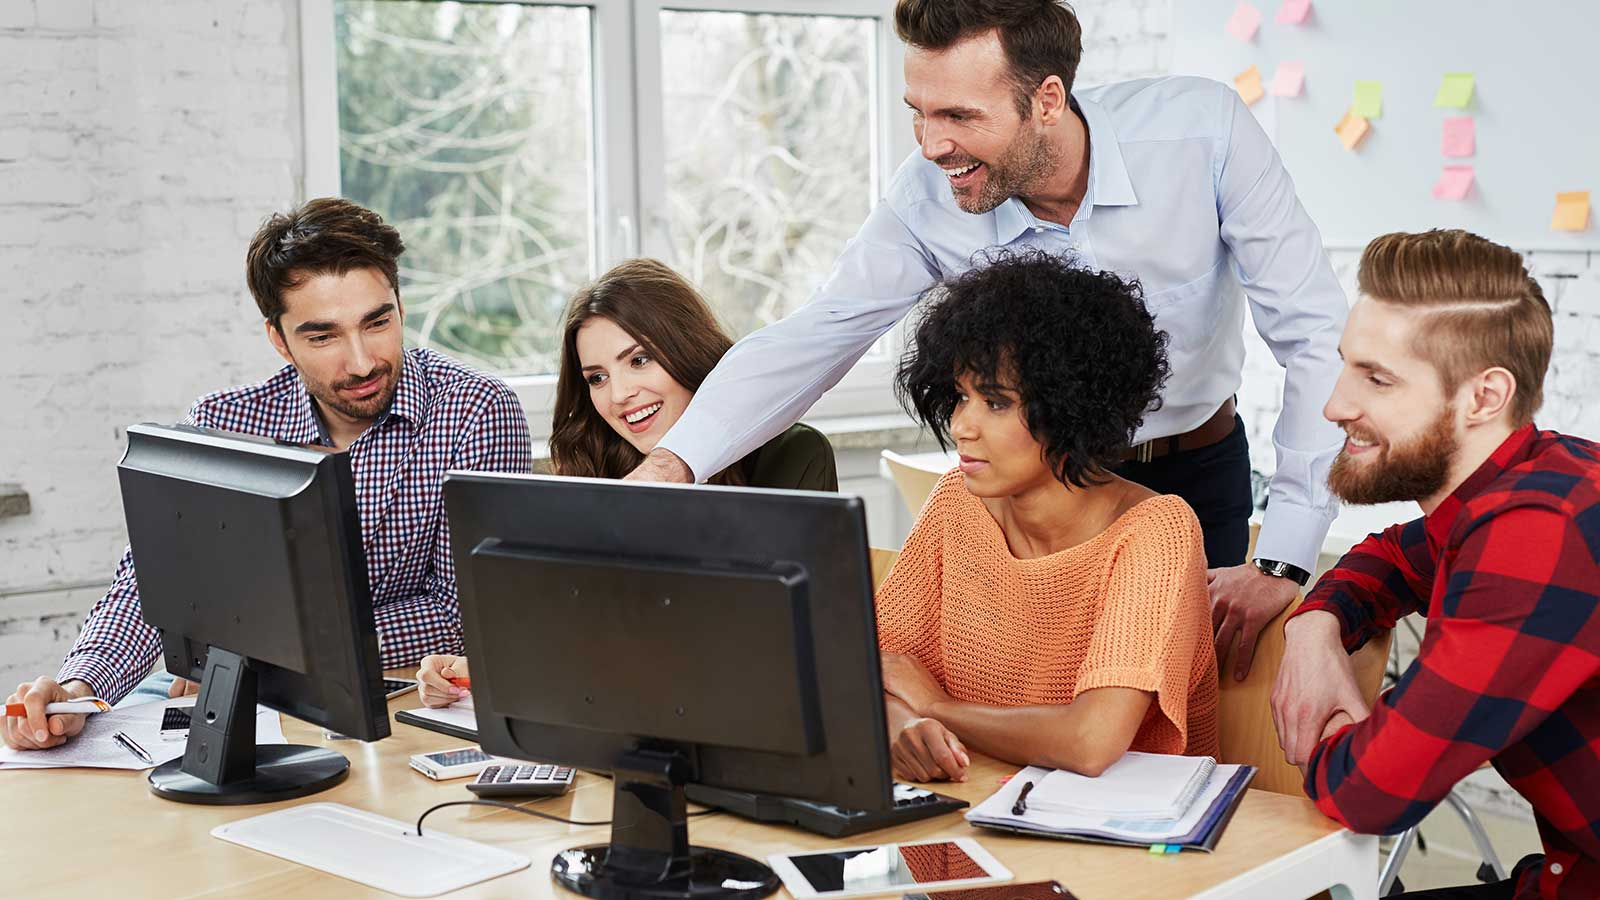 Identifying teamwork behaviours through computer simulation